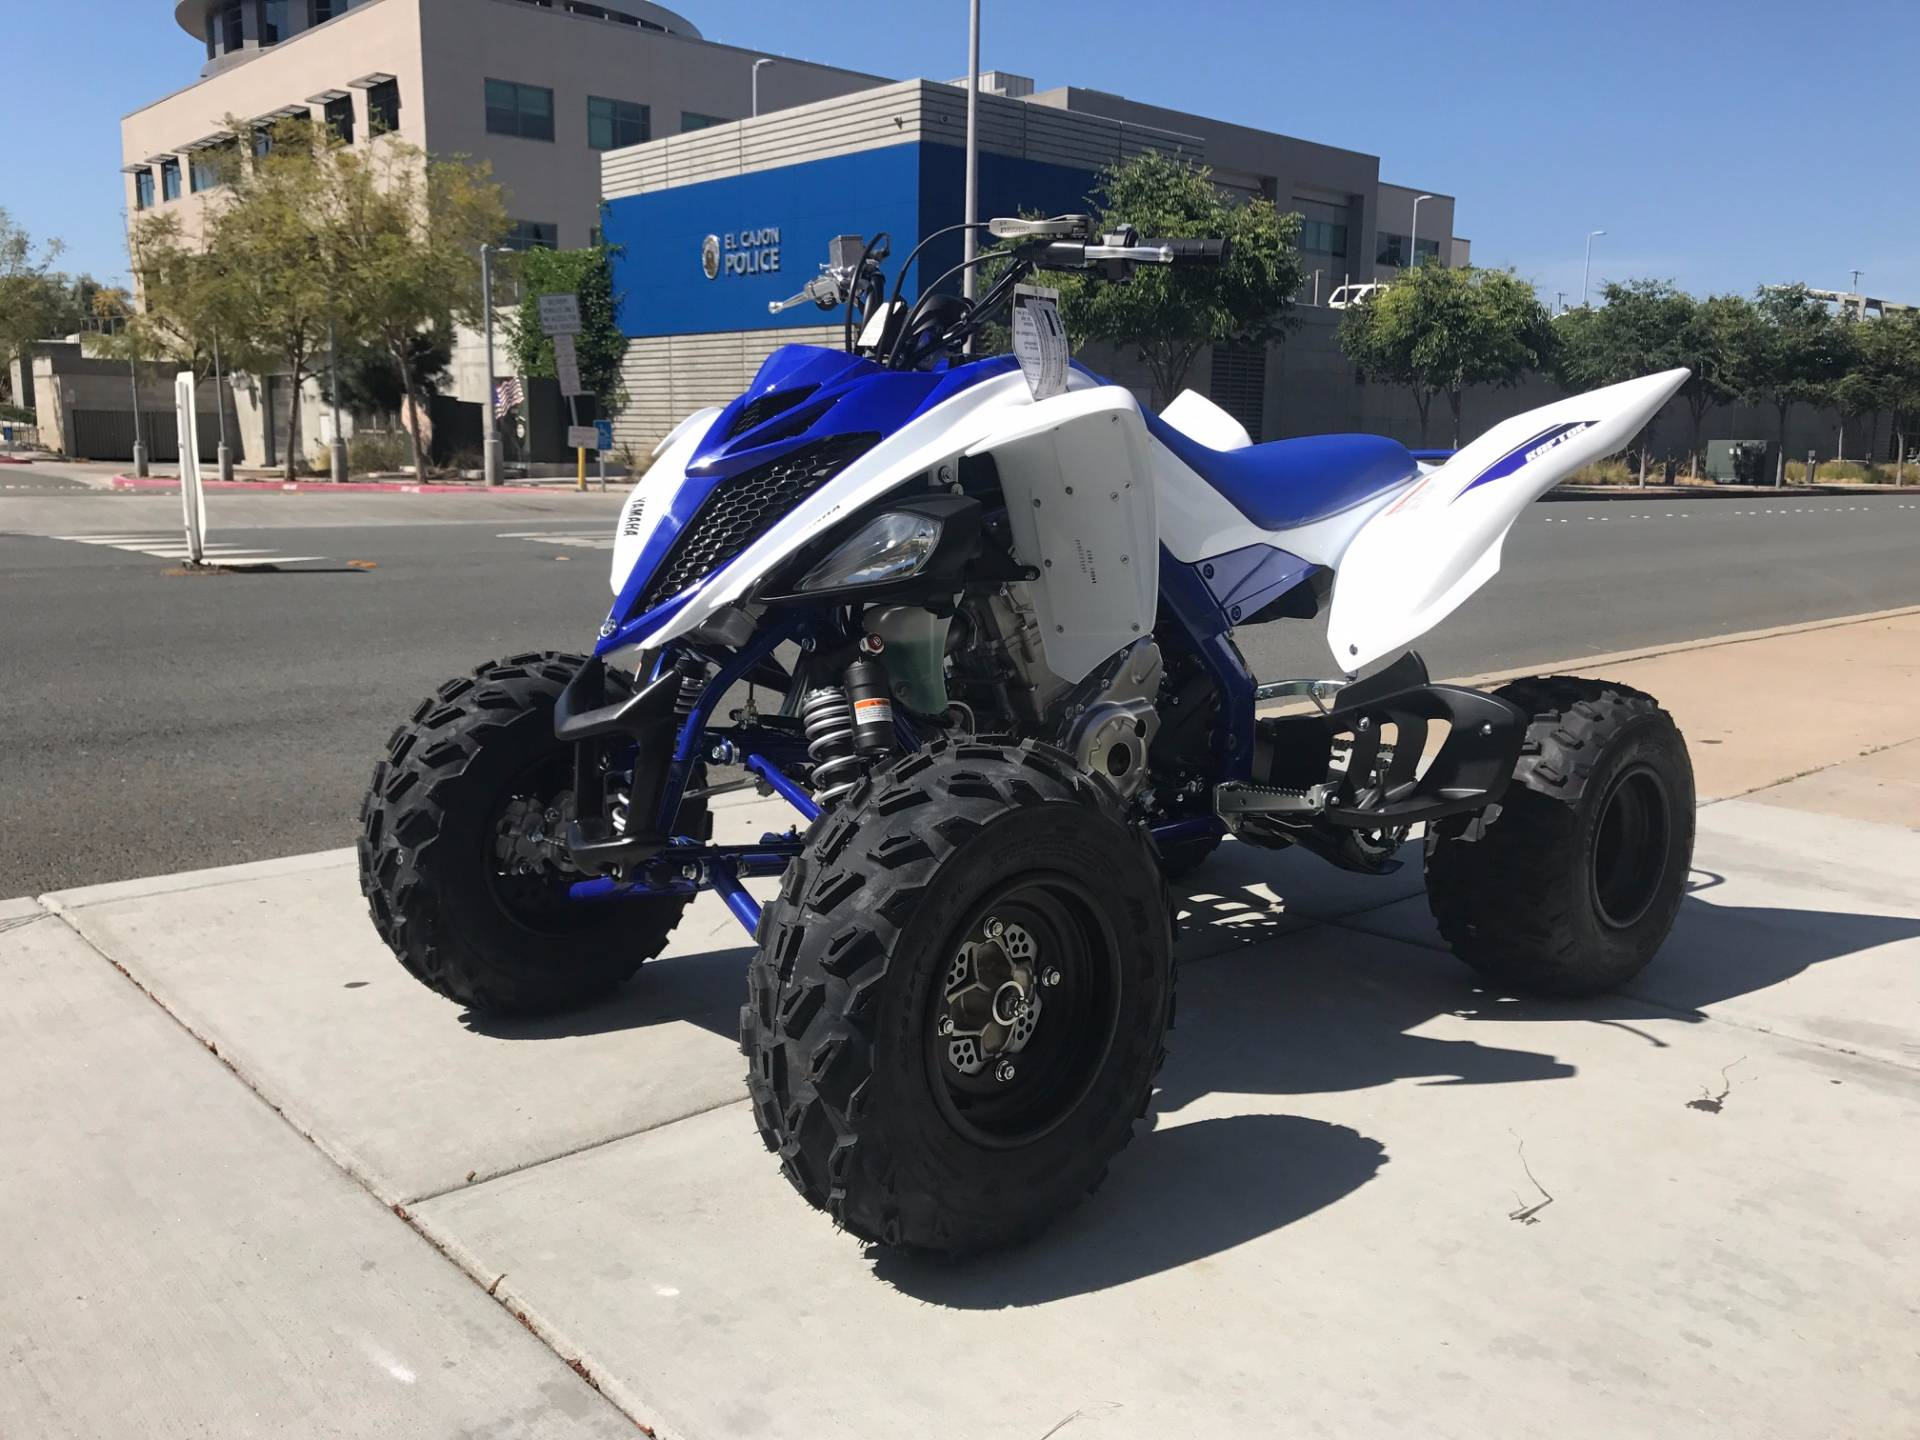 2017 Yamaha Raptor 700R 4